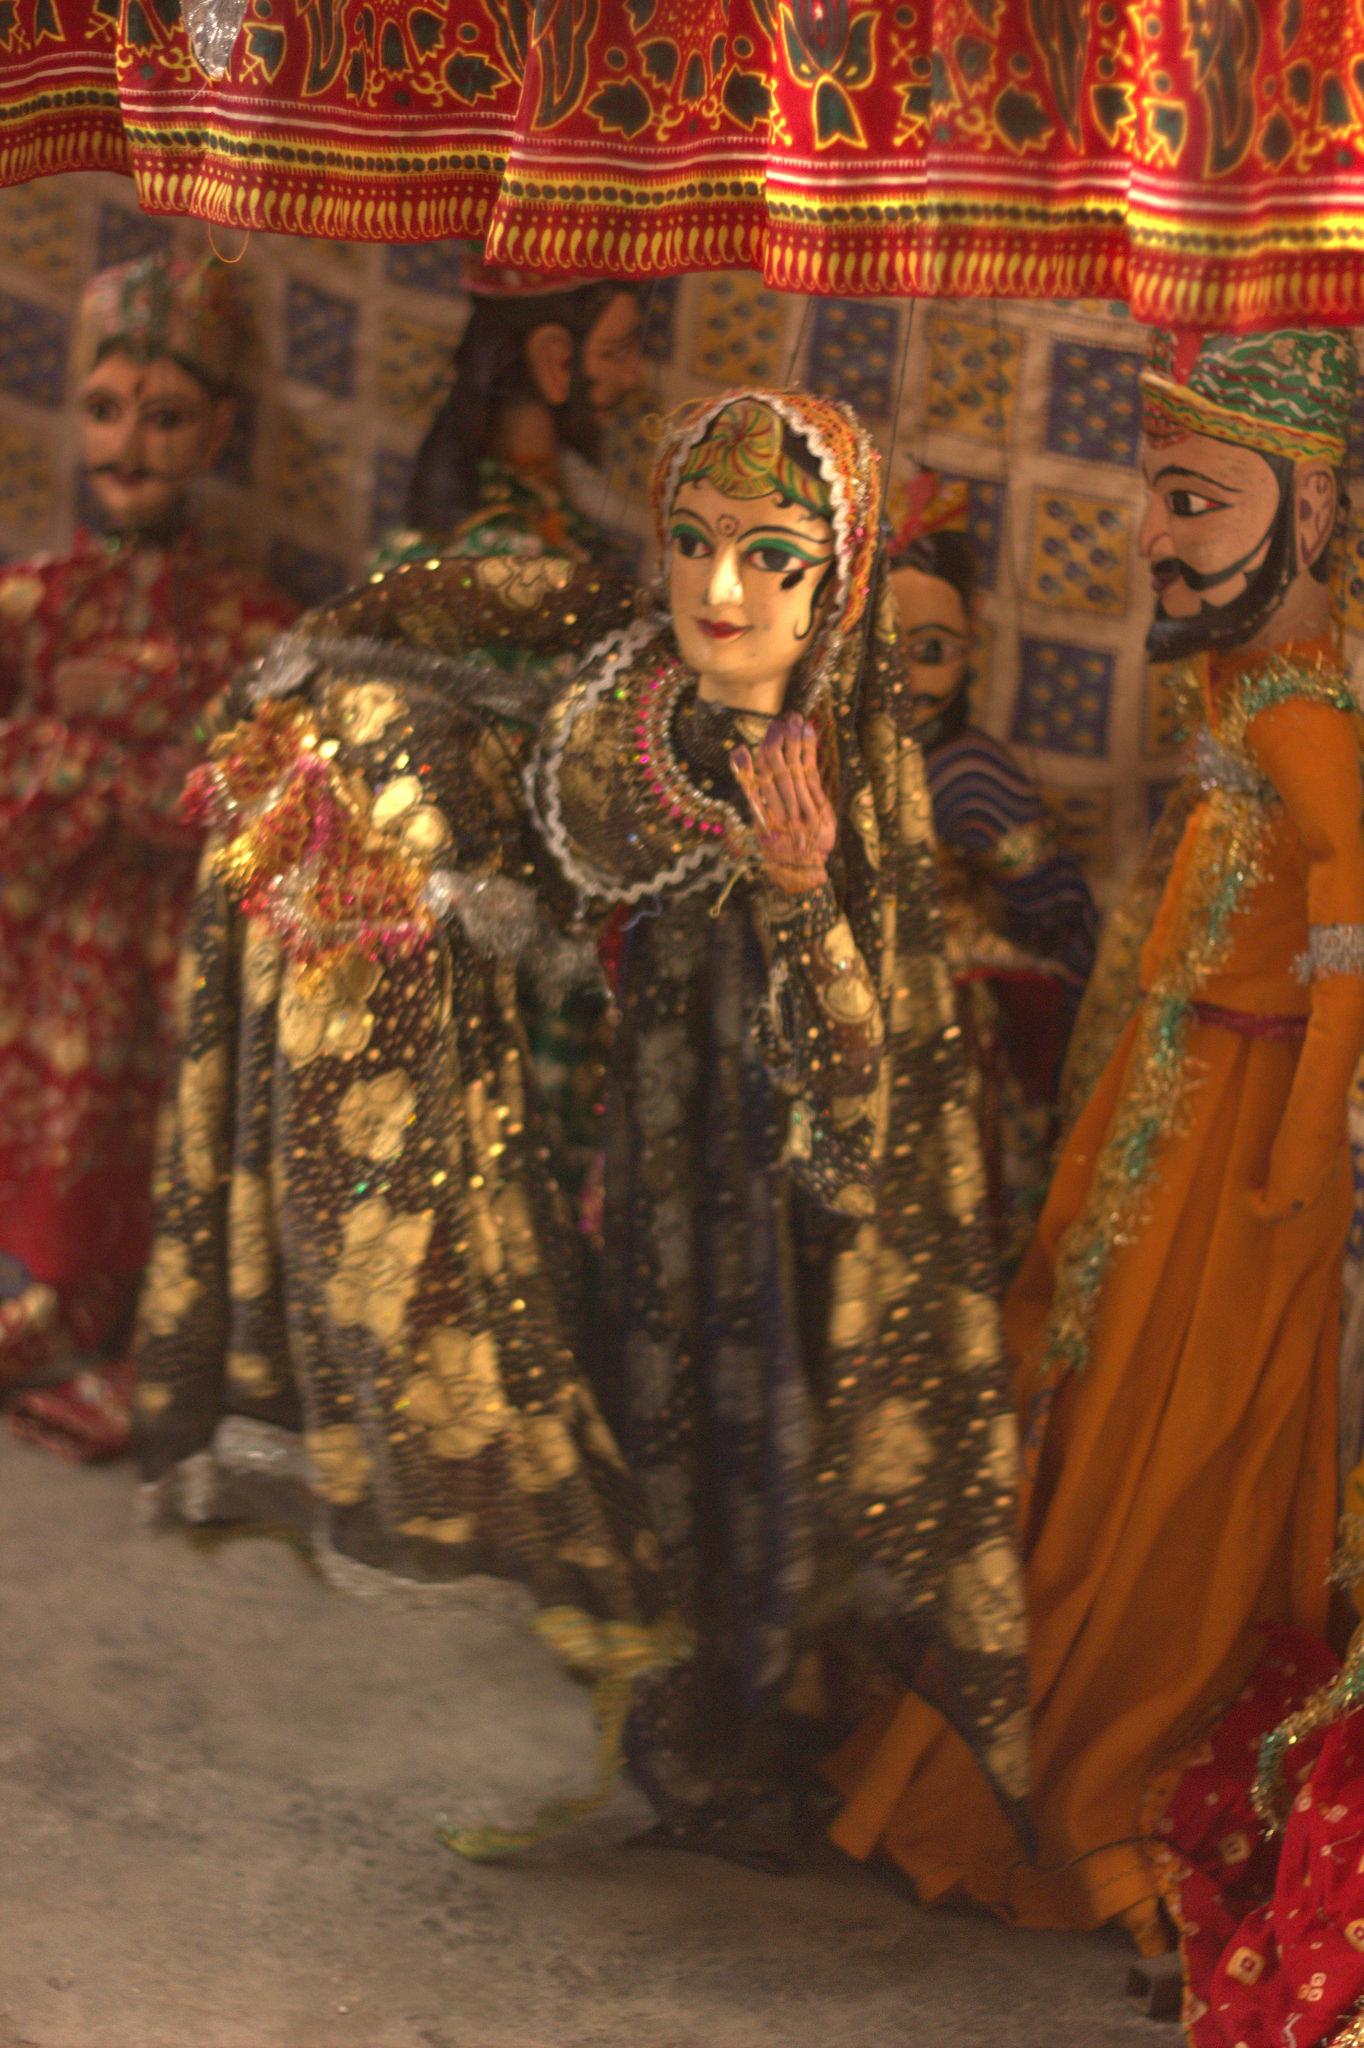 A Rajasthani puppet show in progress at Kathputli Colony